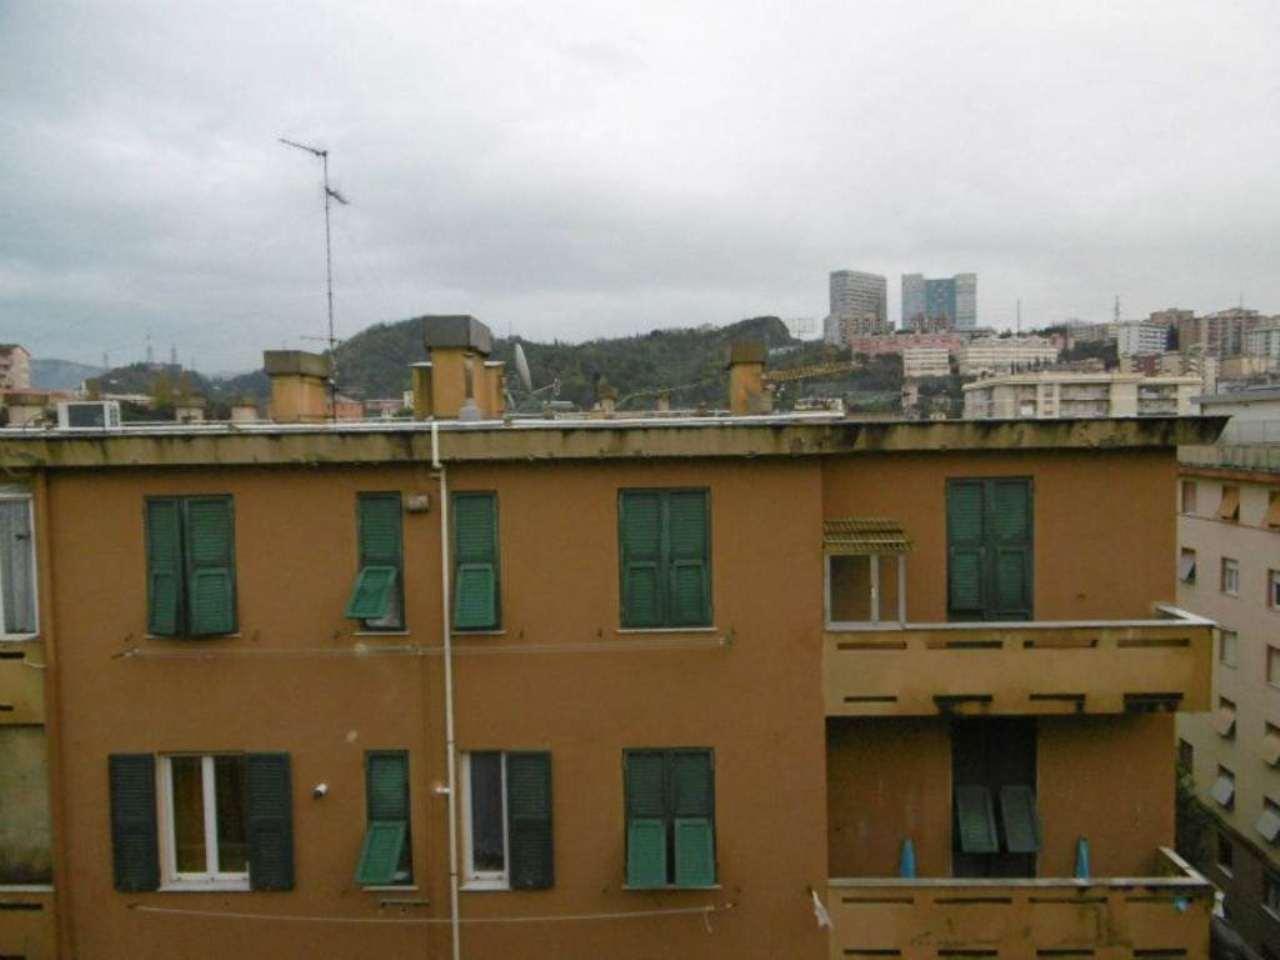 Bilocale Genova Via Maroncelli 7